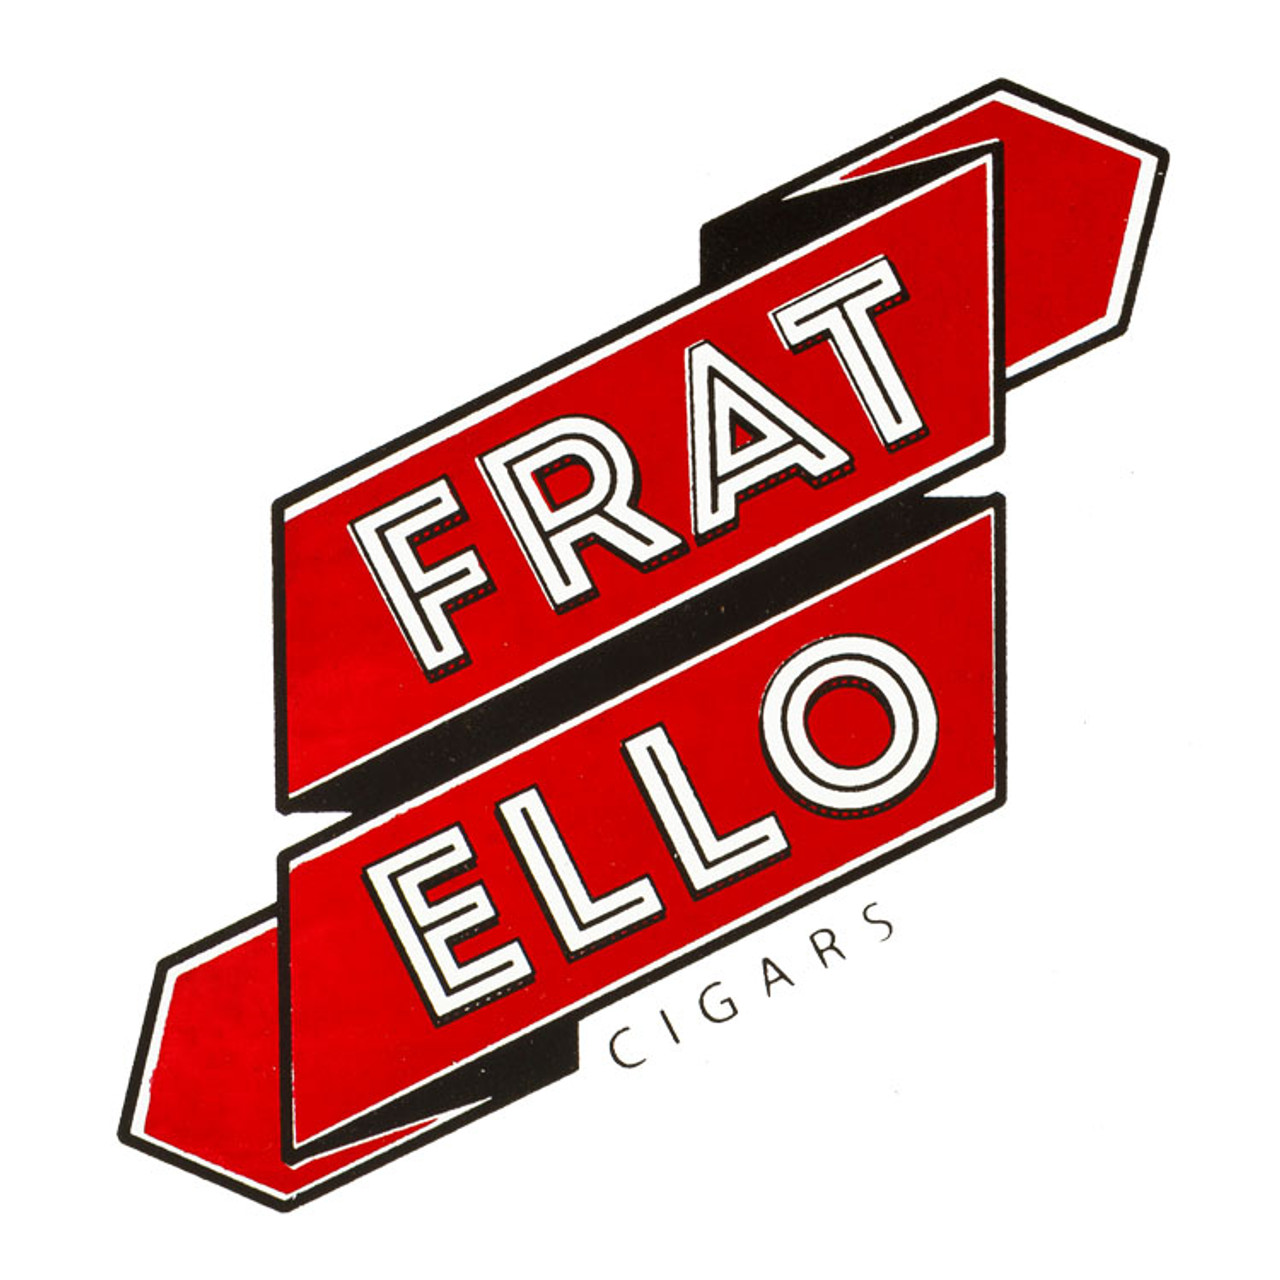 Fratello Bianco Bianco II Cigars - 6 x 50 (Box of 20)